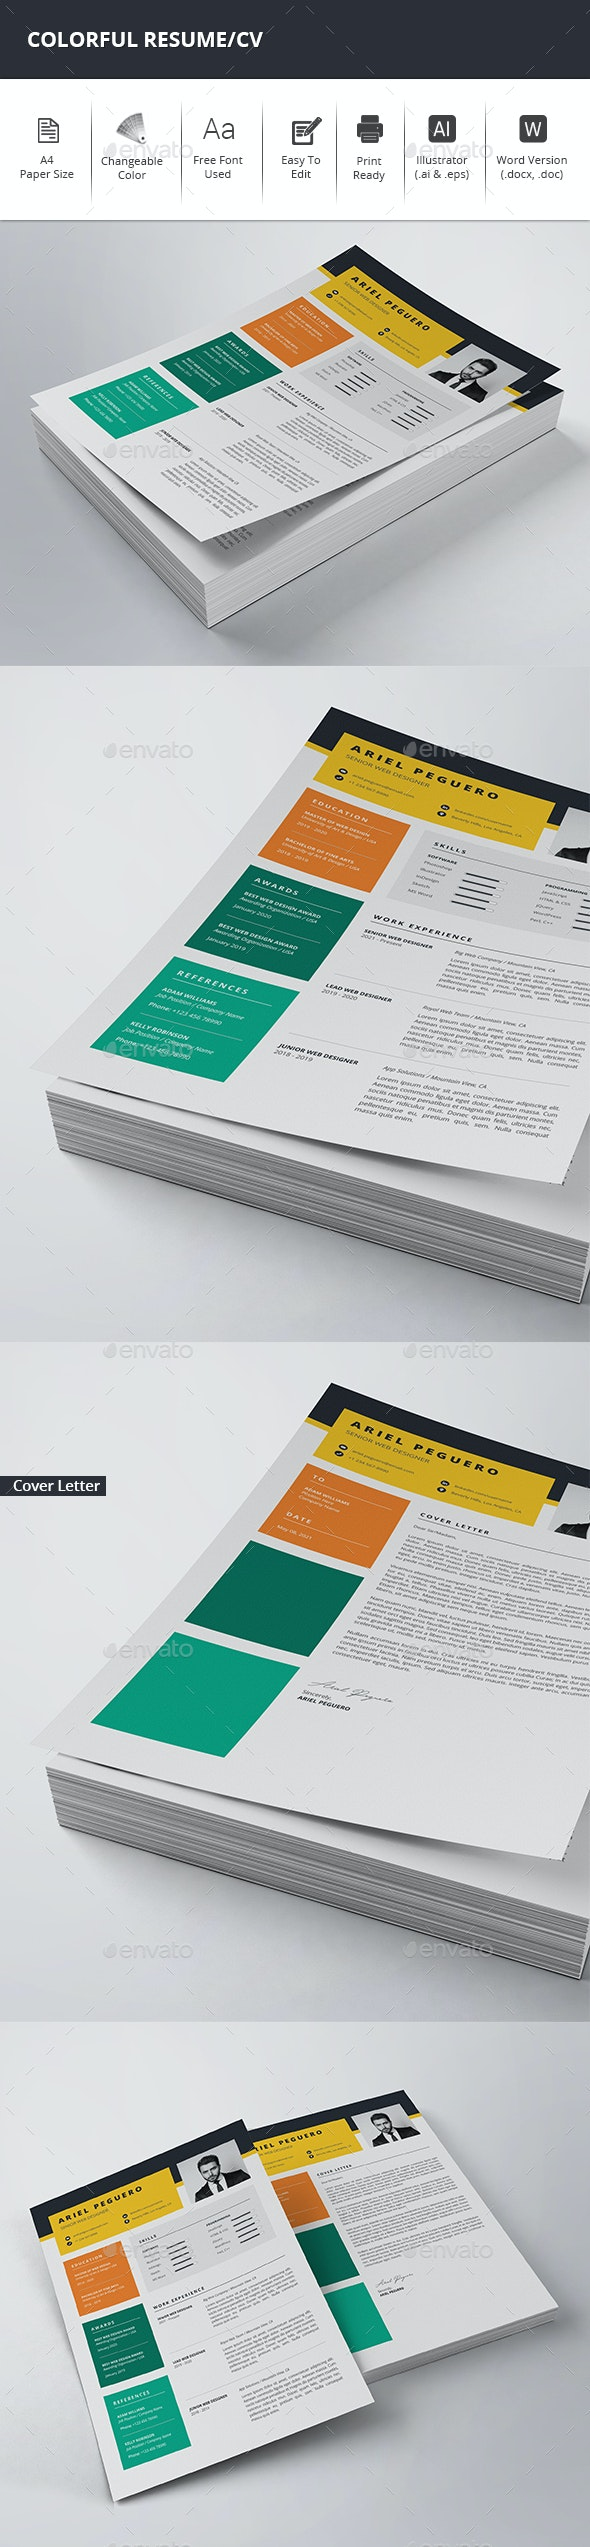 Colorful Resume/CV - Resumes Stationery